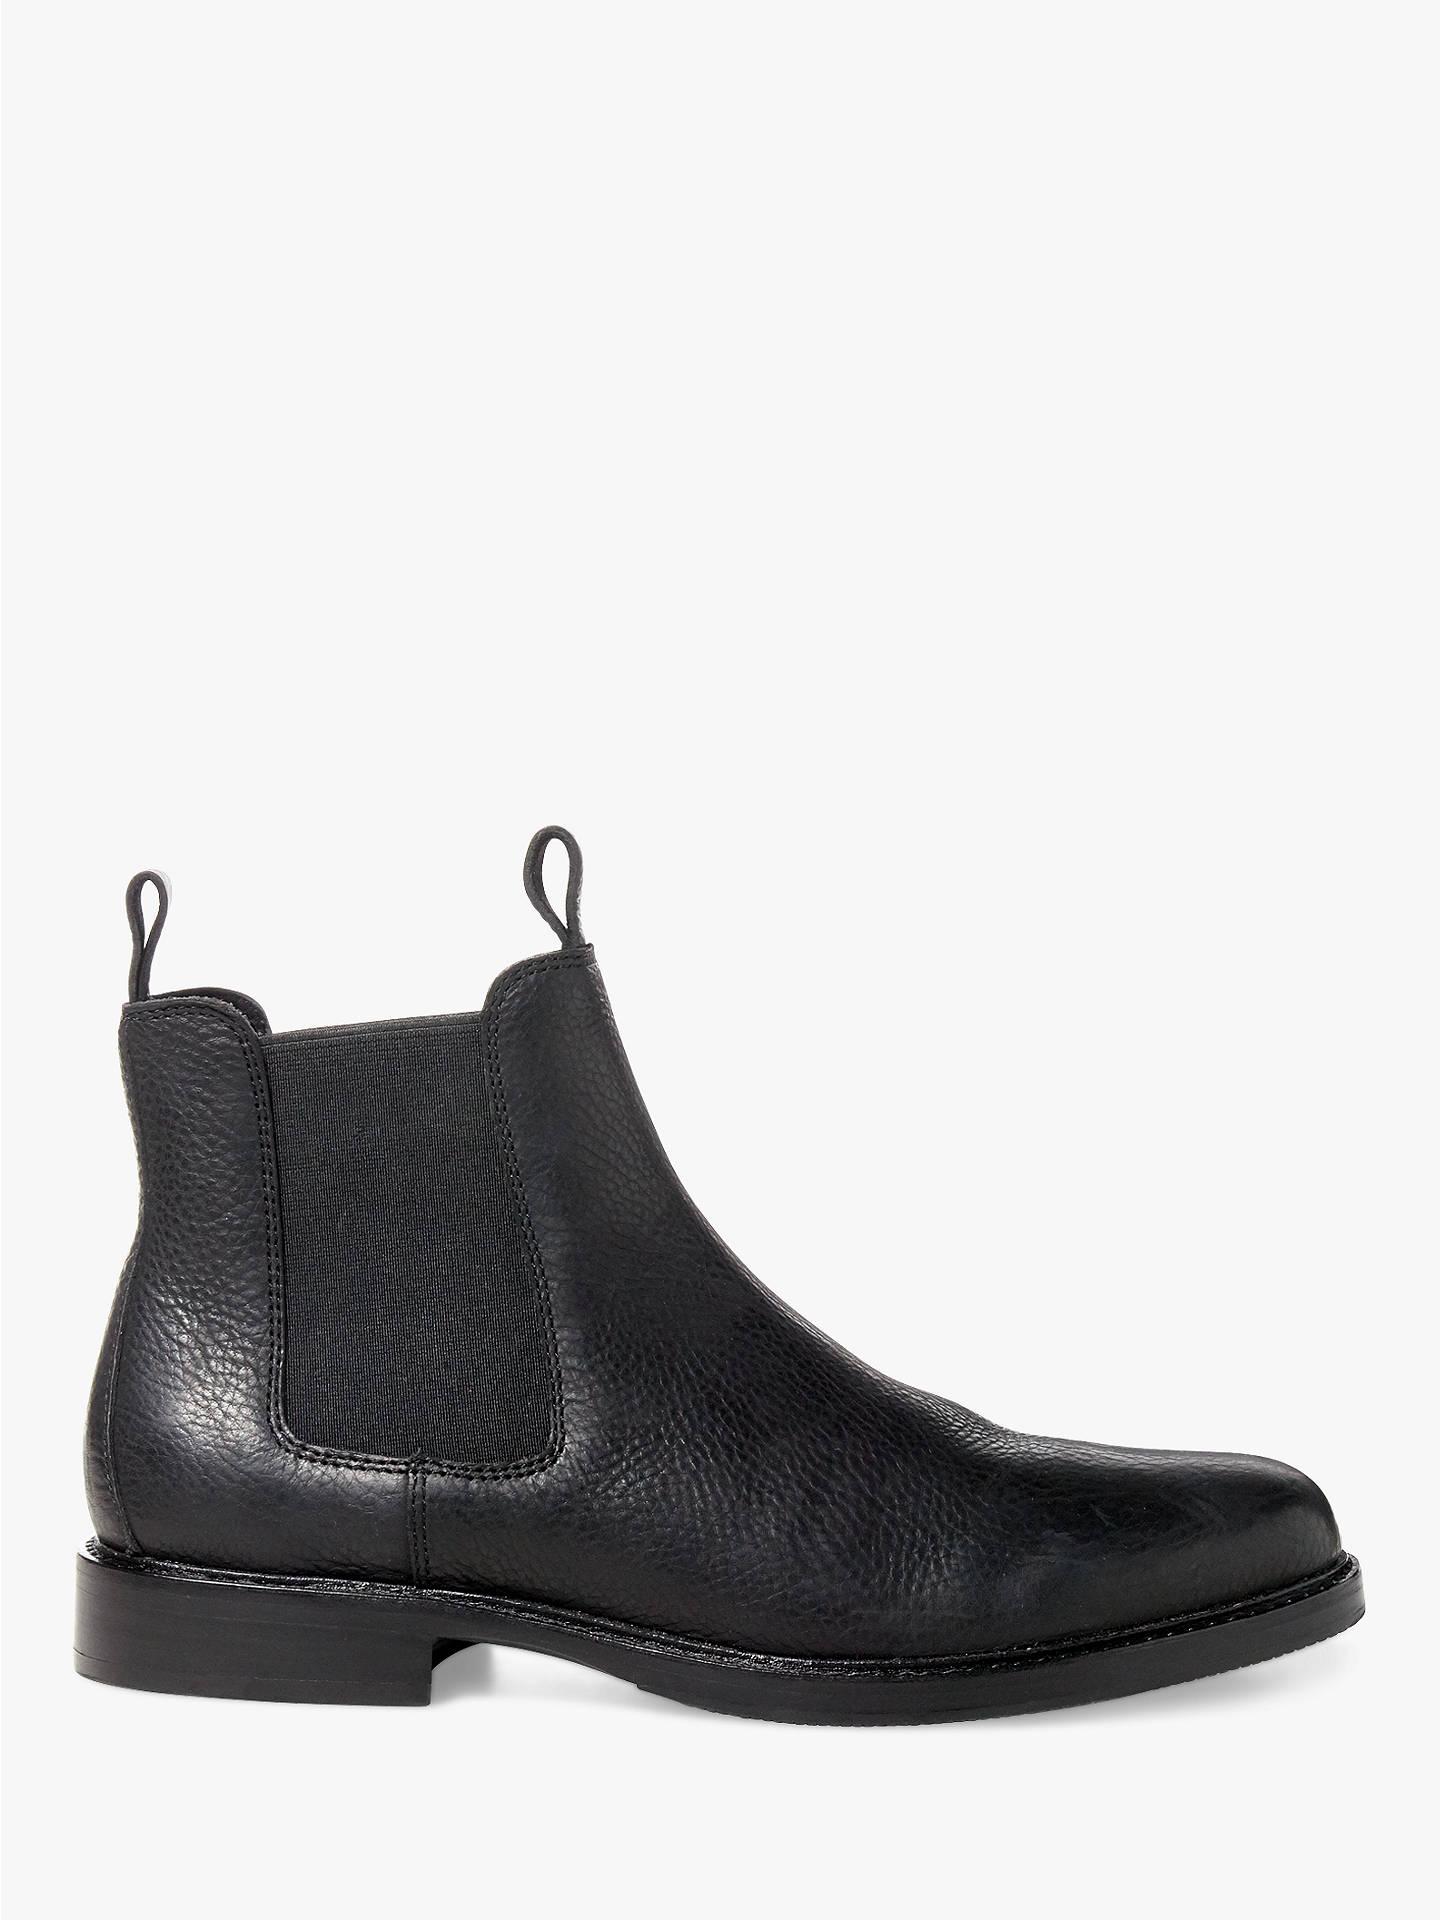 def223ce1 Polo Ralph Lauren Normanton Leather Chelsea Boots at John Lewis ...